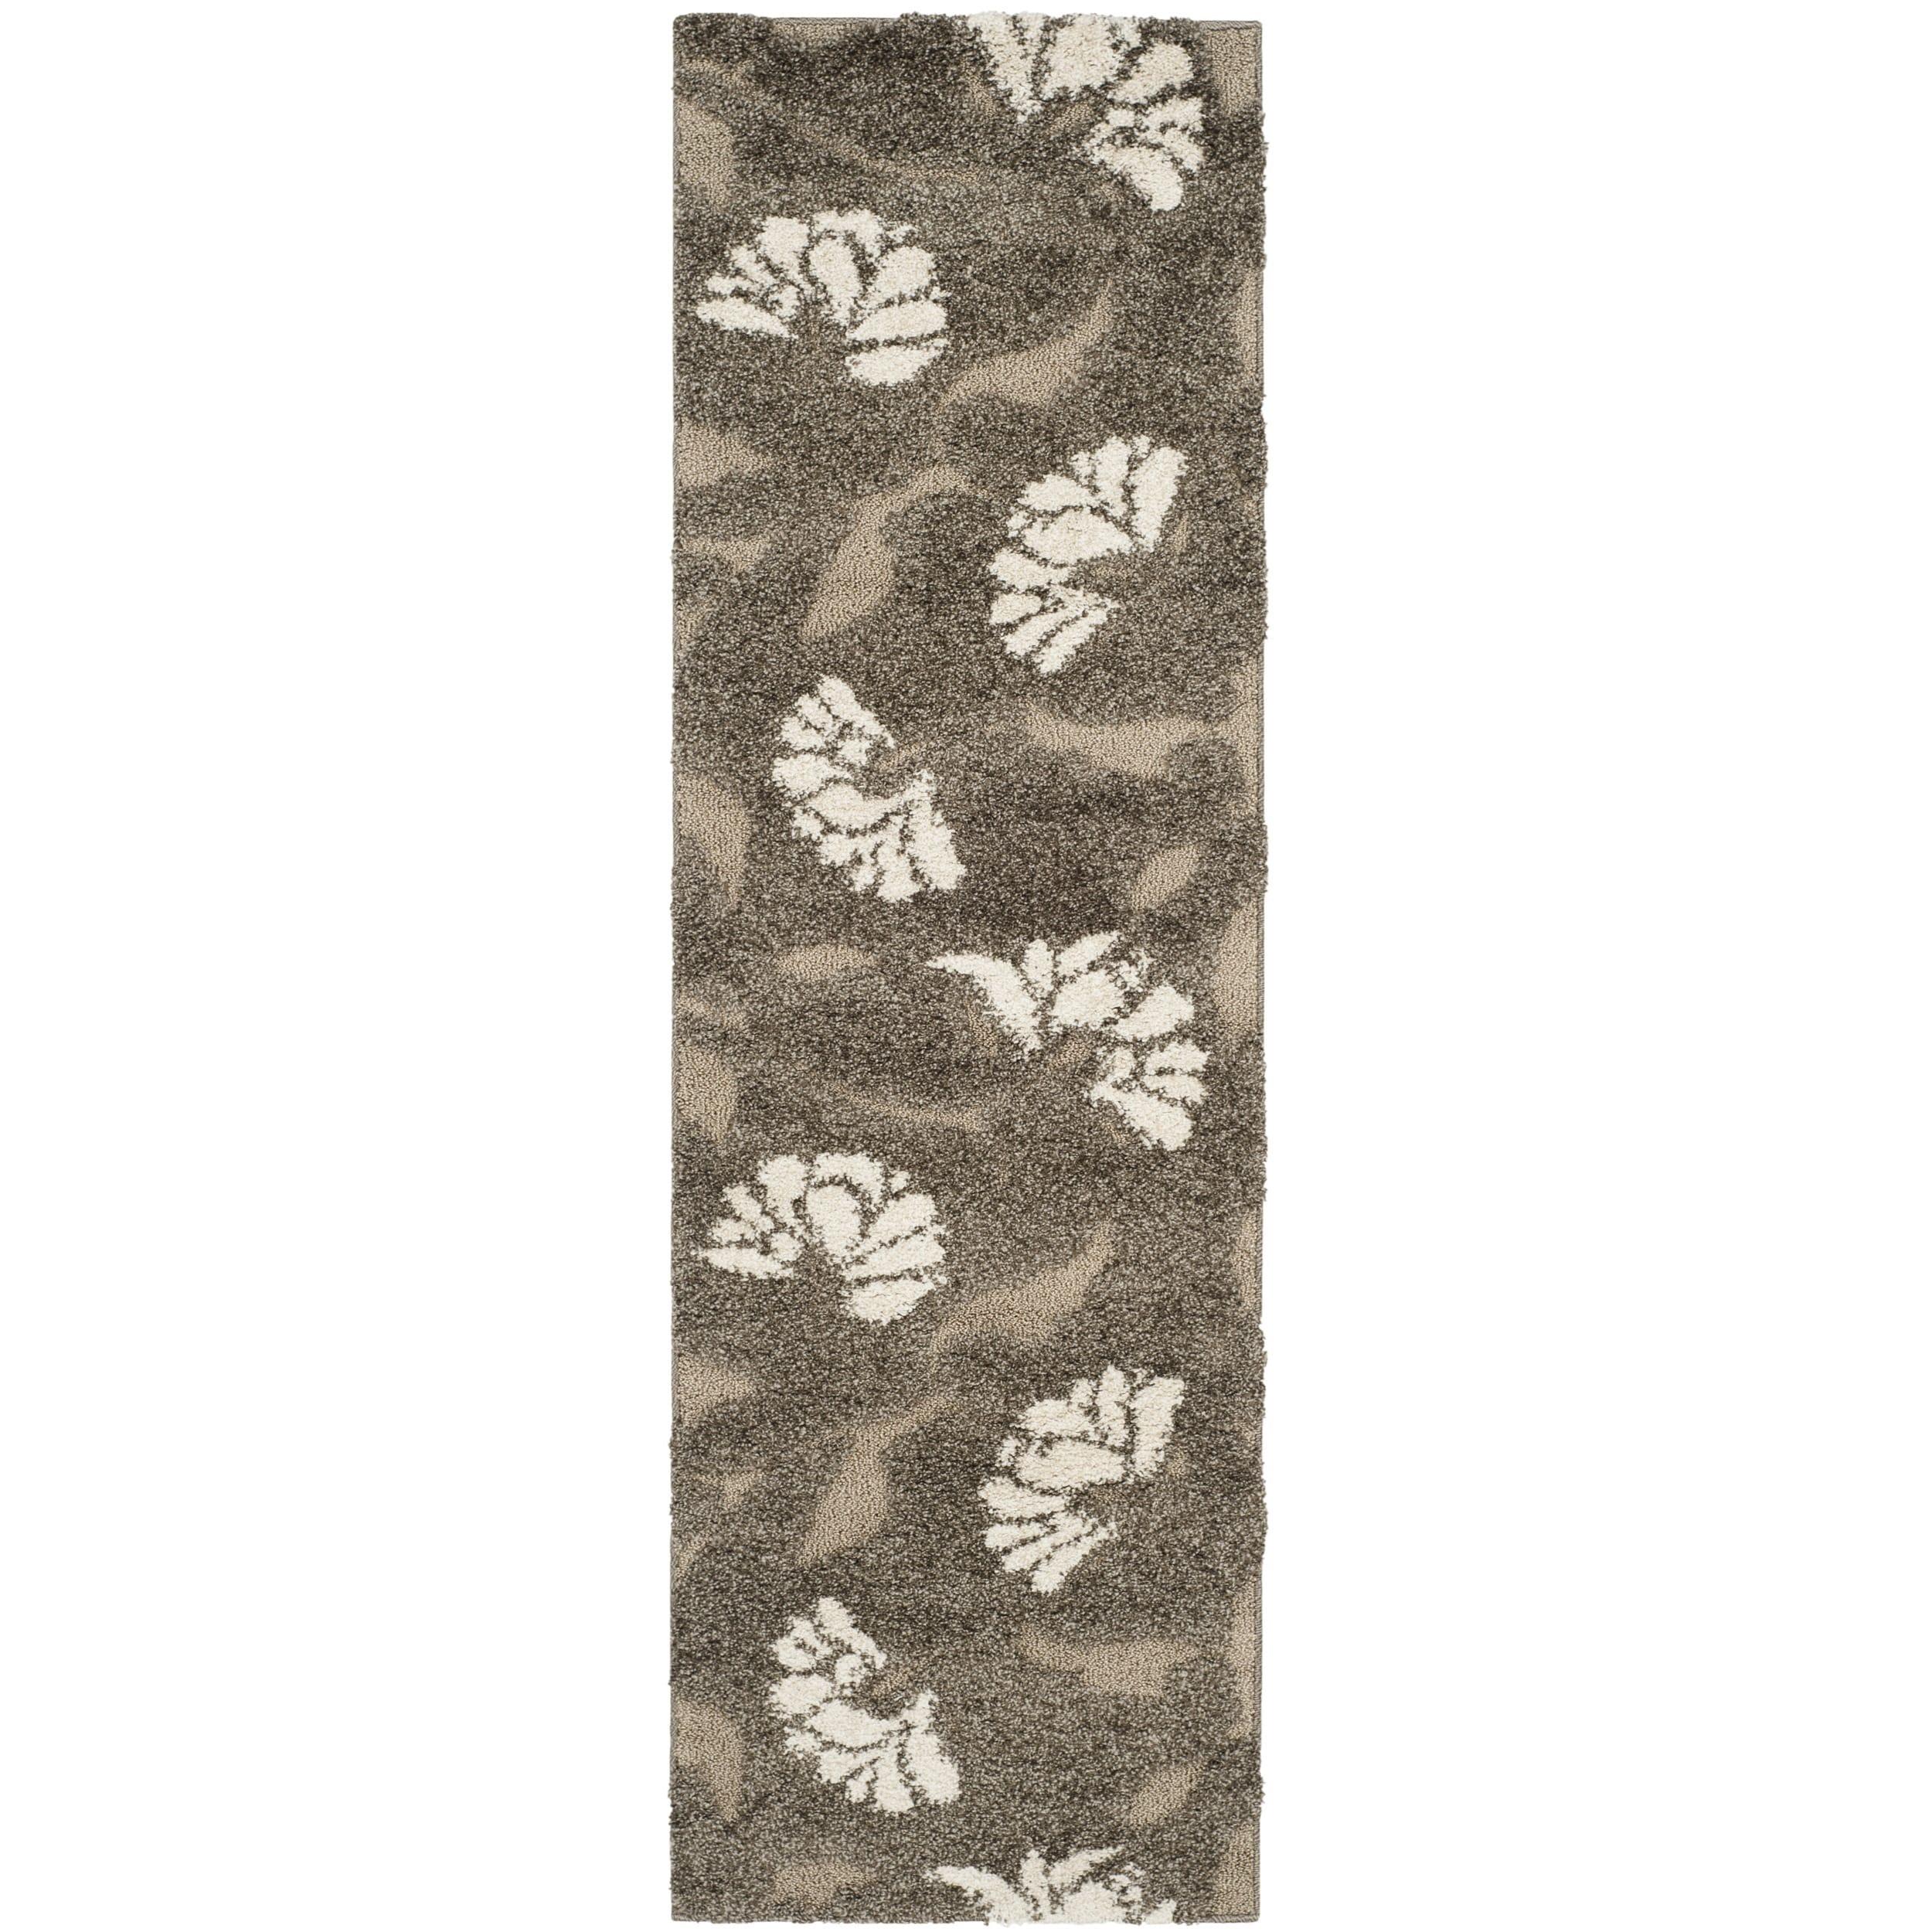 d60b59b17db Shop Safavieh Florida Shag Smoke  Beige Floral Area Rug - 3 3